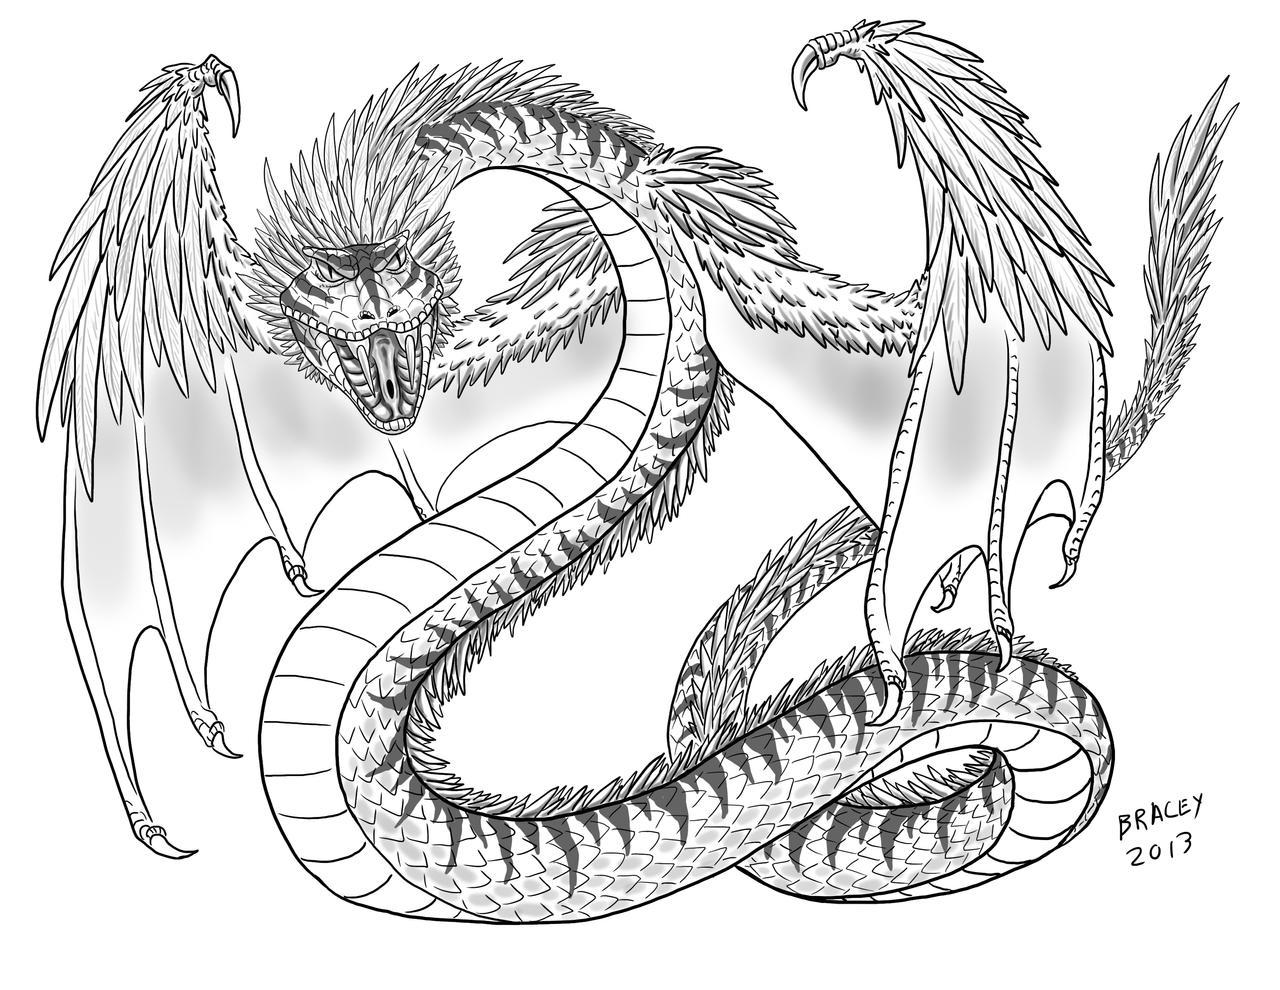 Kaiju Commissions - Quetzalcoatl by Bracey100 on DeviantArt